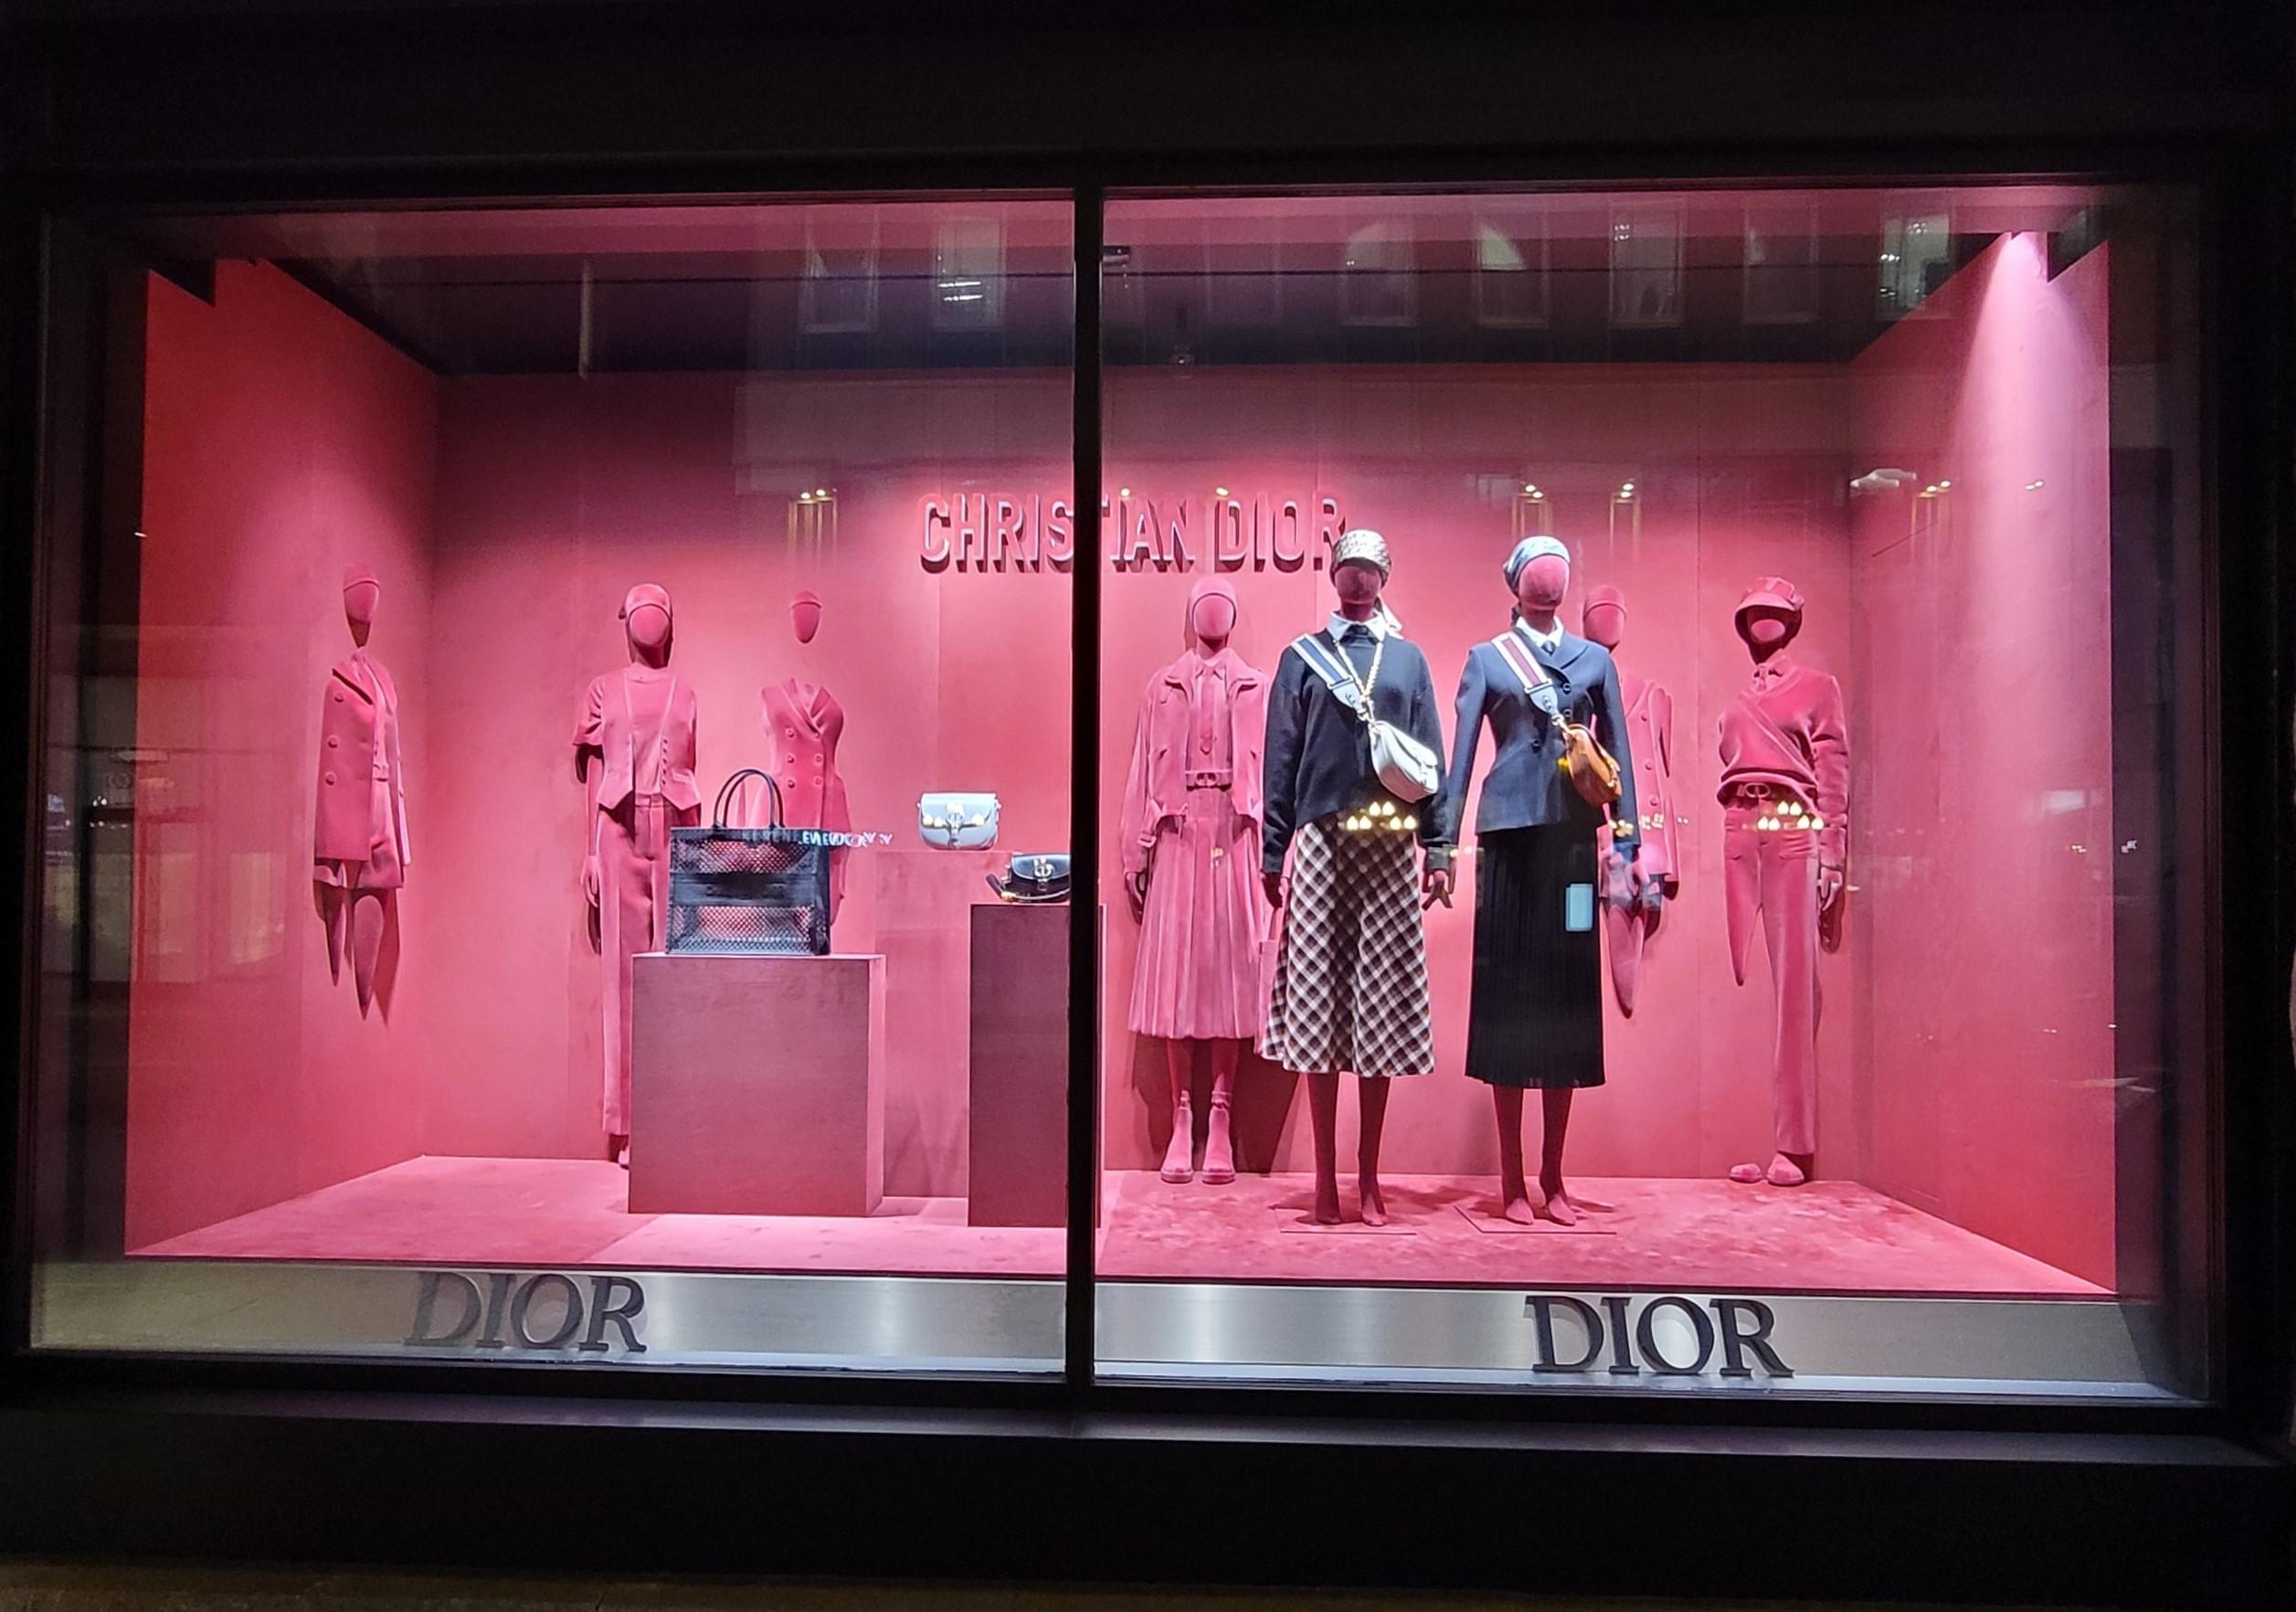 Christian Dior – Holt Renfrew – Ogilvy Montreal